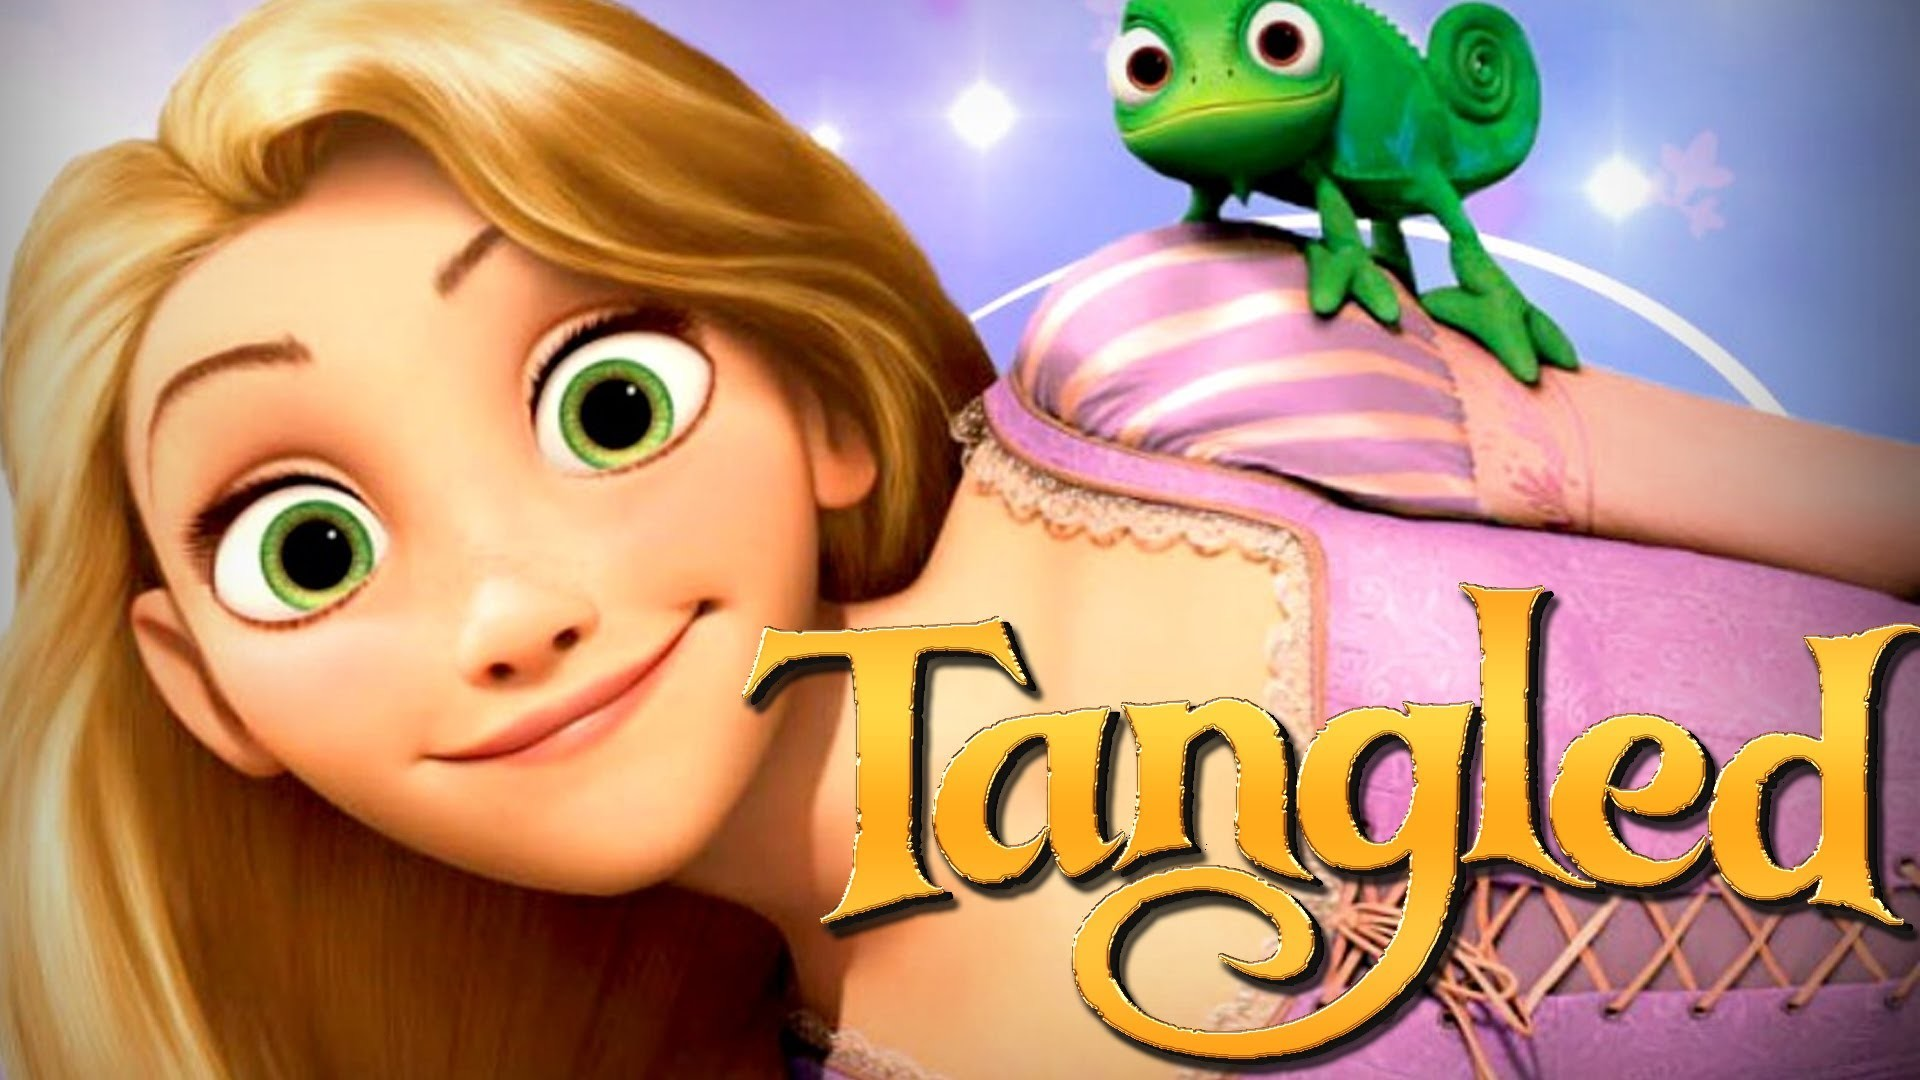 1920x1080 Rapunzel Of Disney Princesses Images